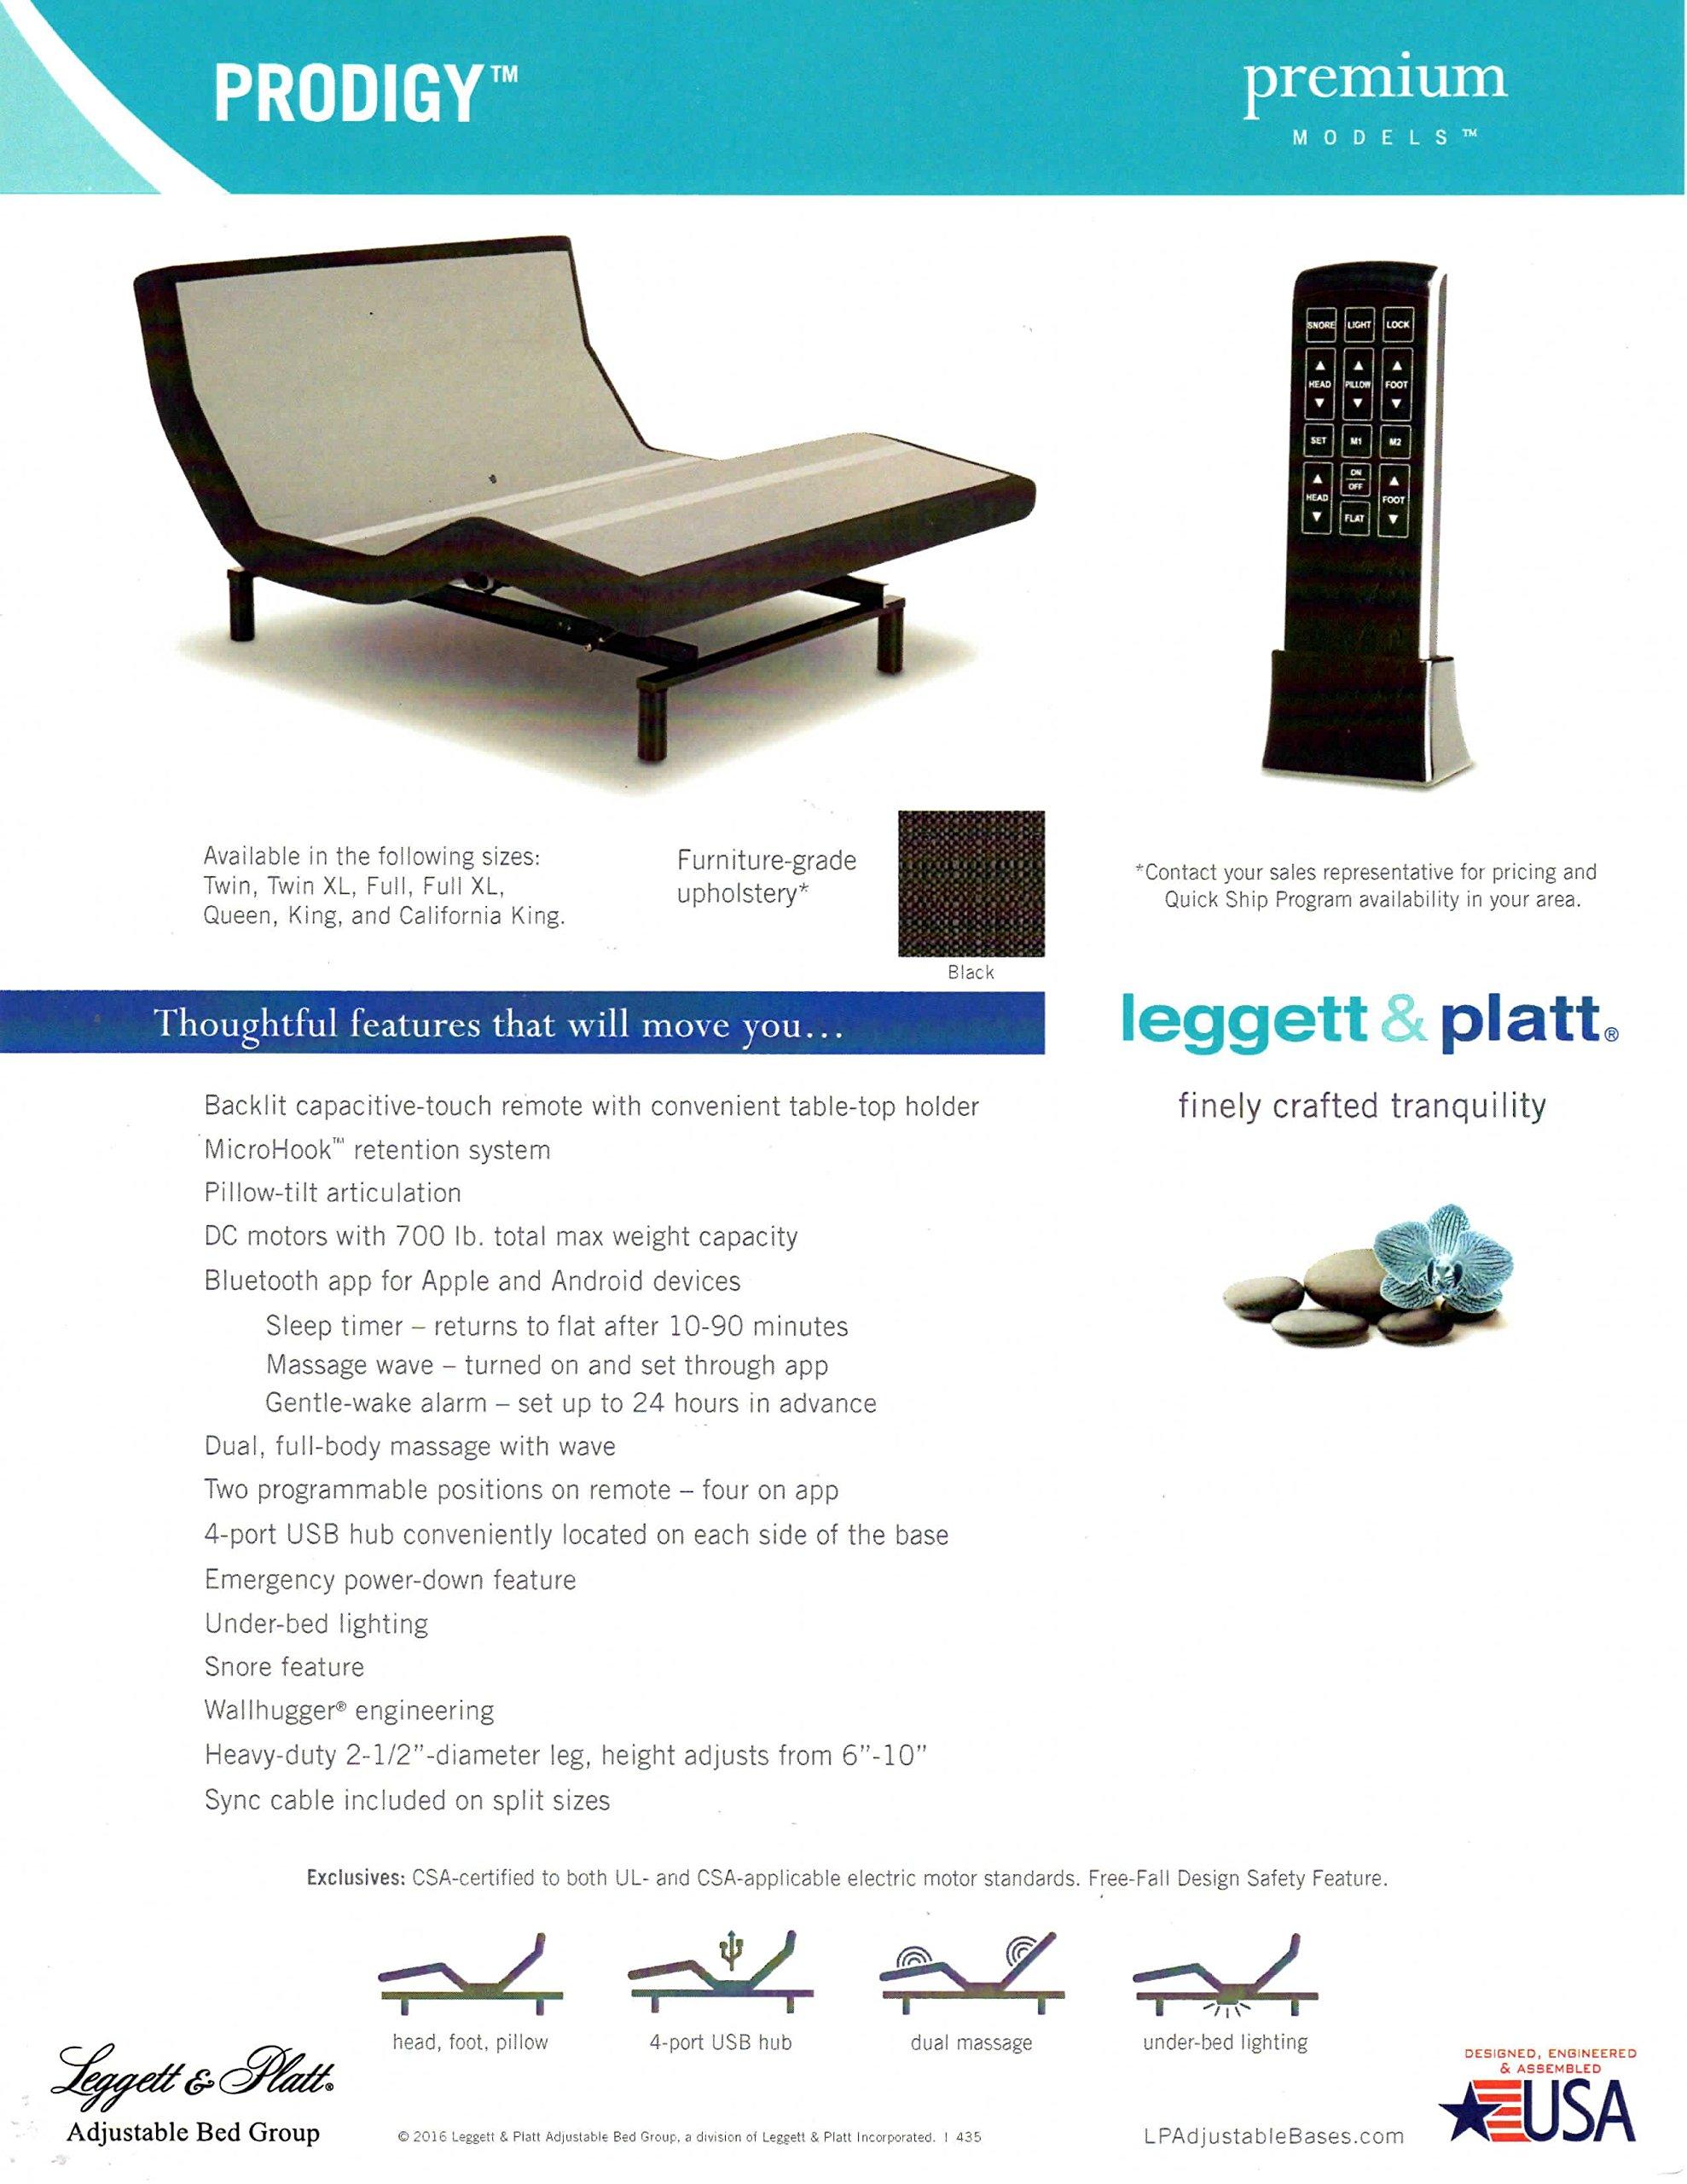 Prodigy 2.0 PRODIGY2-QN Leggett and Platt Adjustable Bed Base with Wireless Massage Bluetooth Head Tilt, Queen